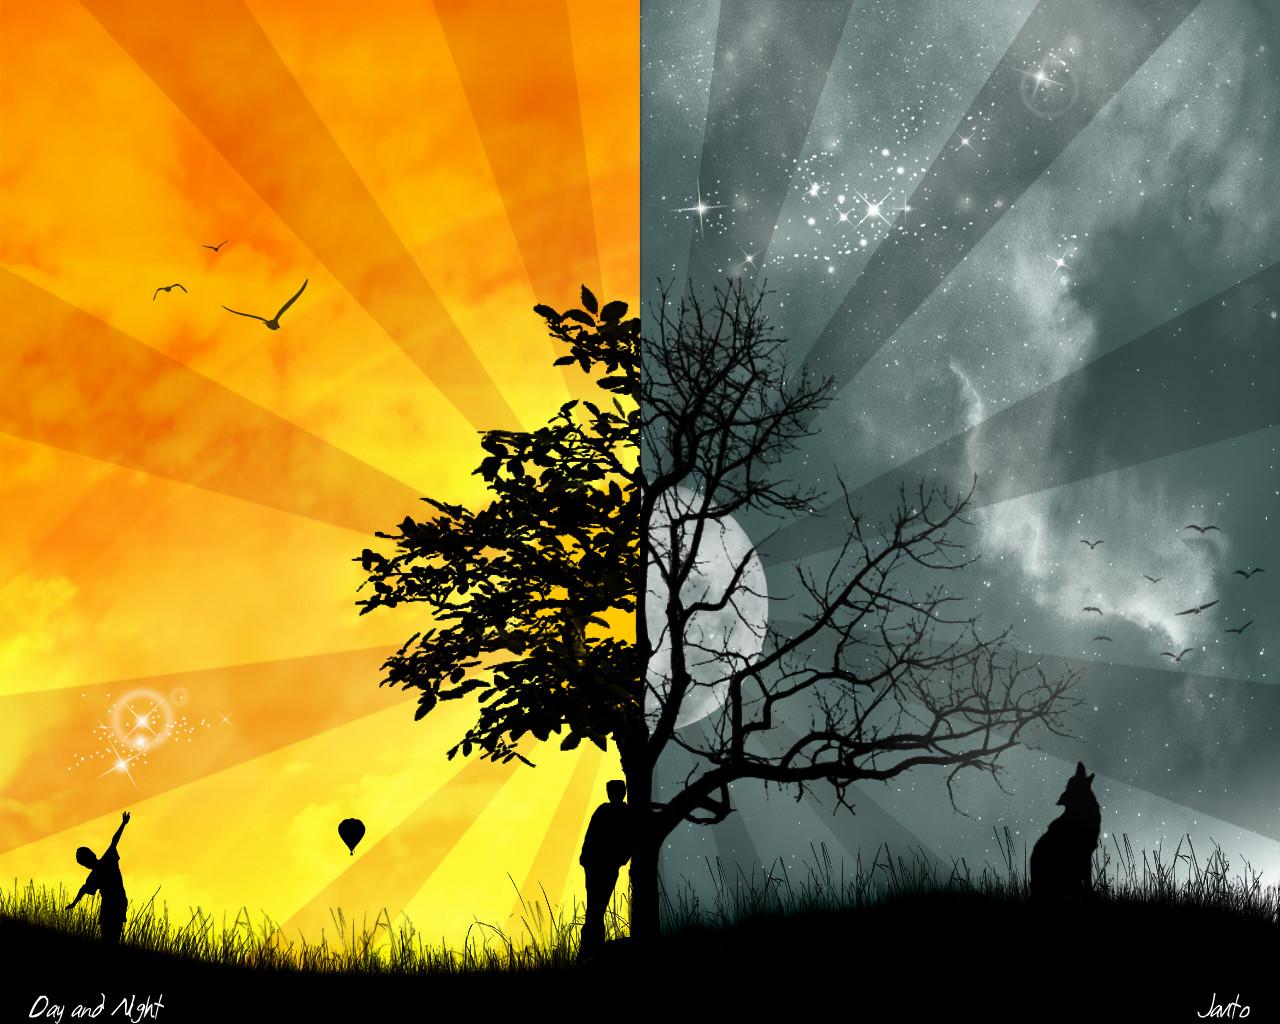 http://1.bp.blogspot.com/-CuyL_8B0H4s/UAKedE7Q8xI/AAAAAAAAEAE/n-oKaqRoKDg/s1600/cool-wallpapers.jpg